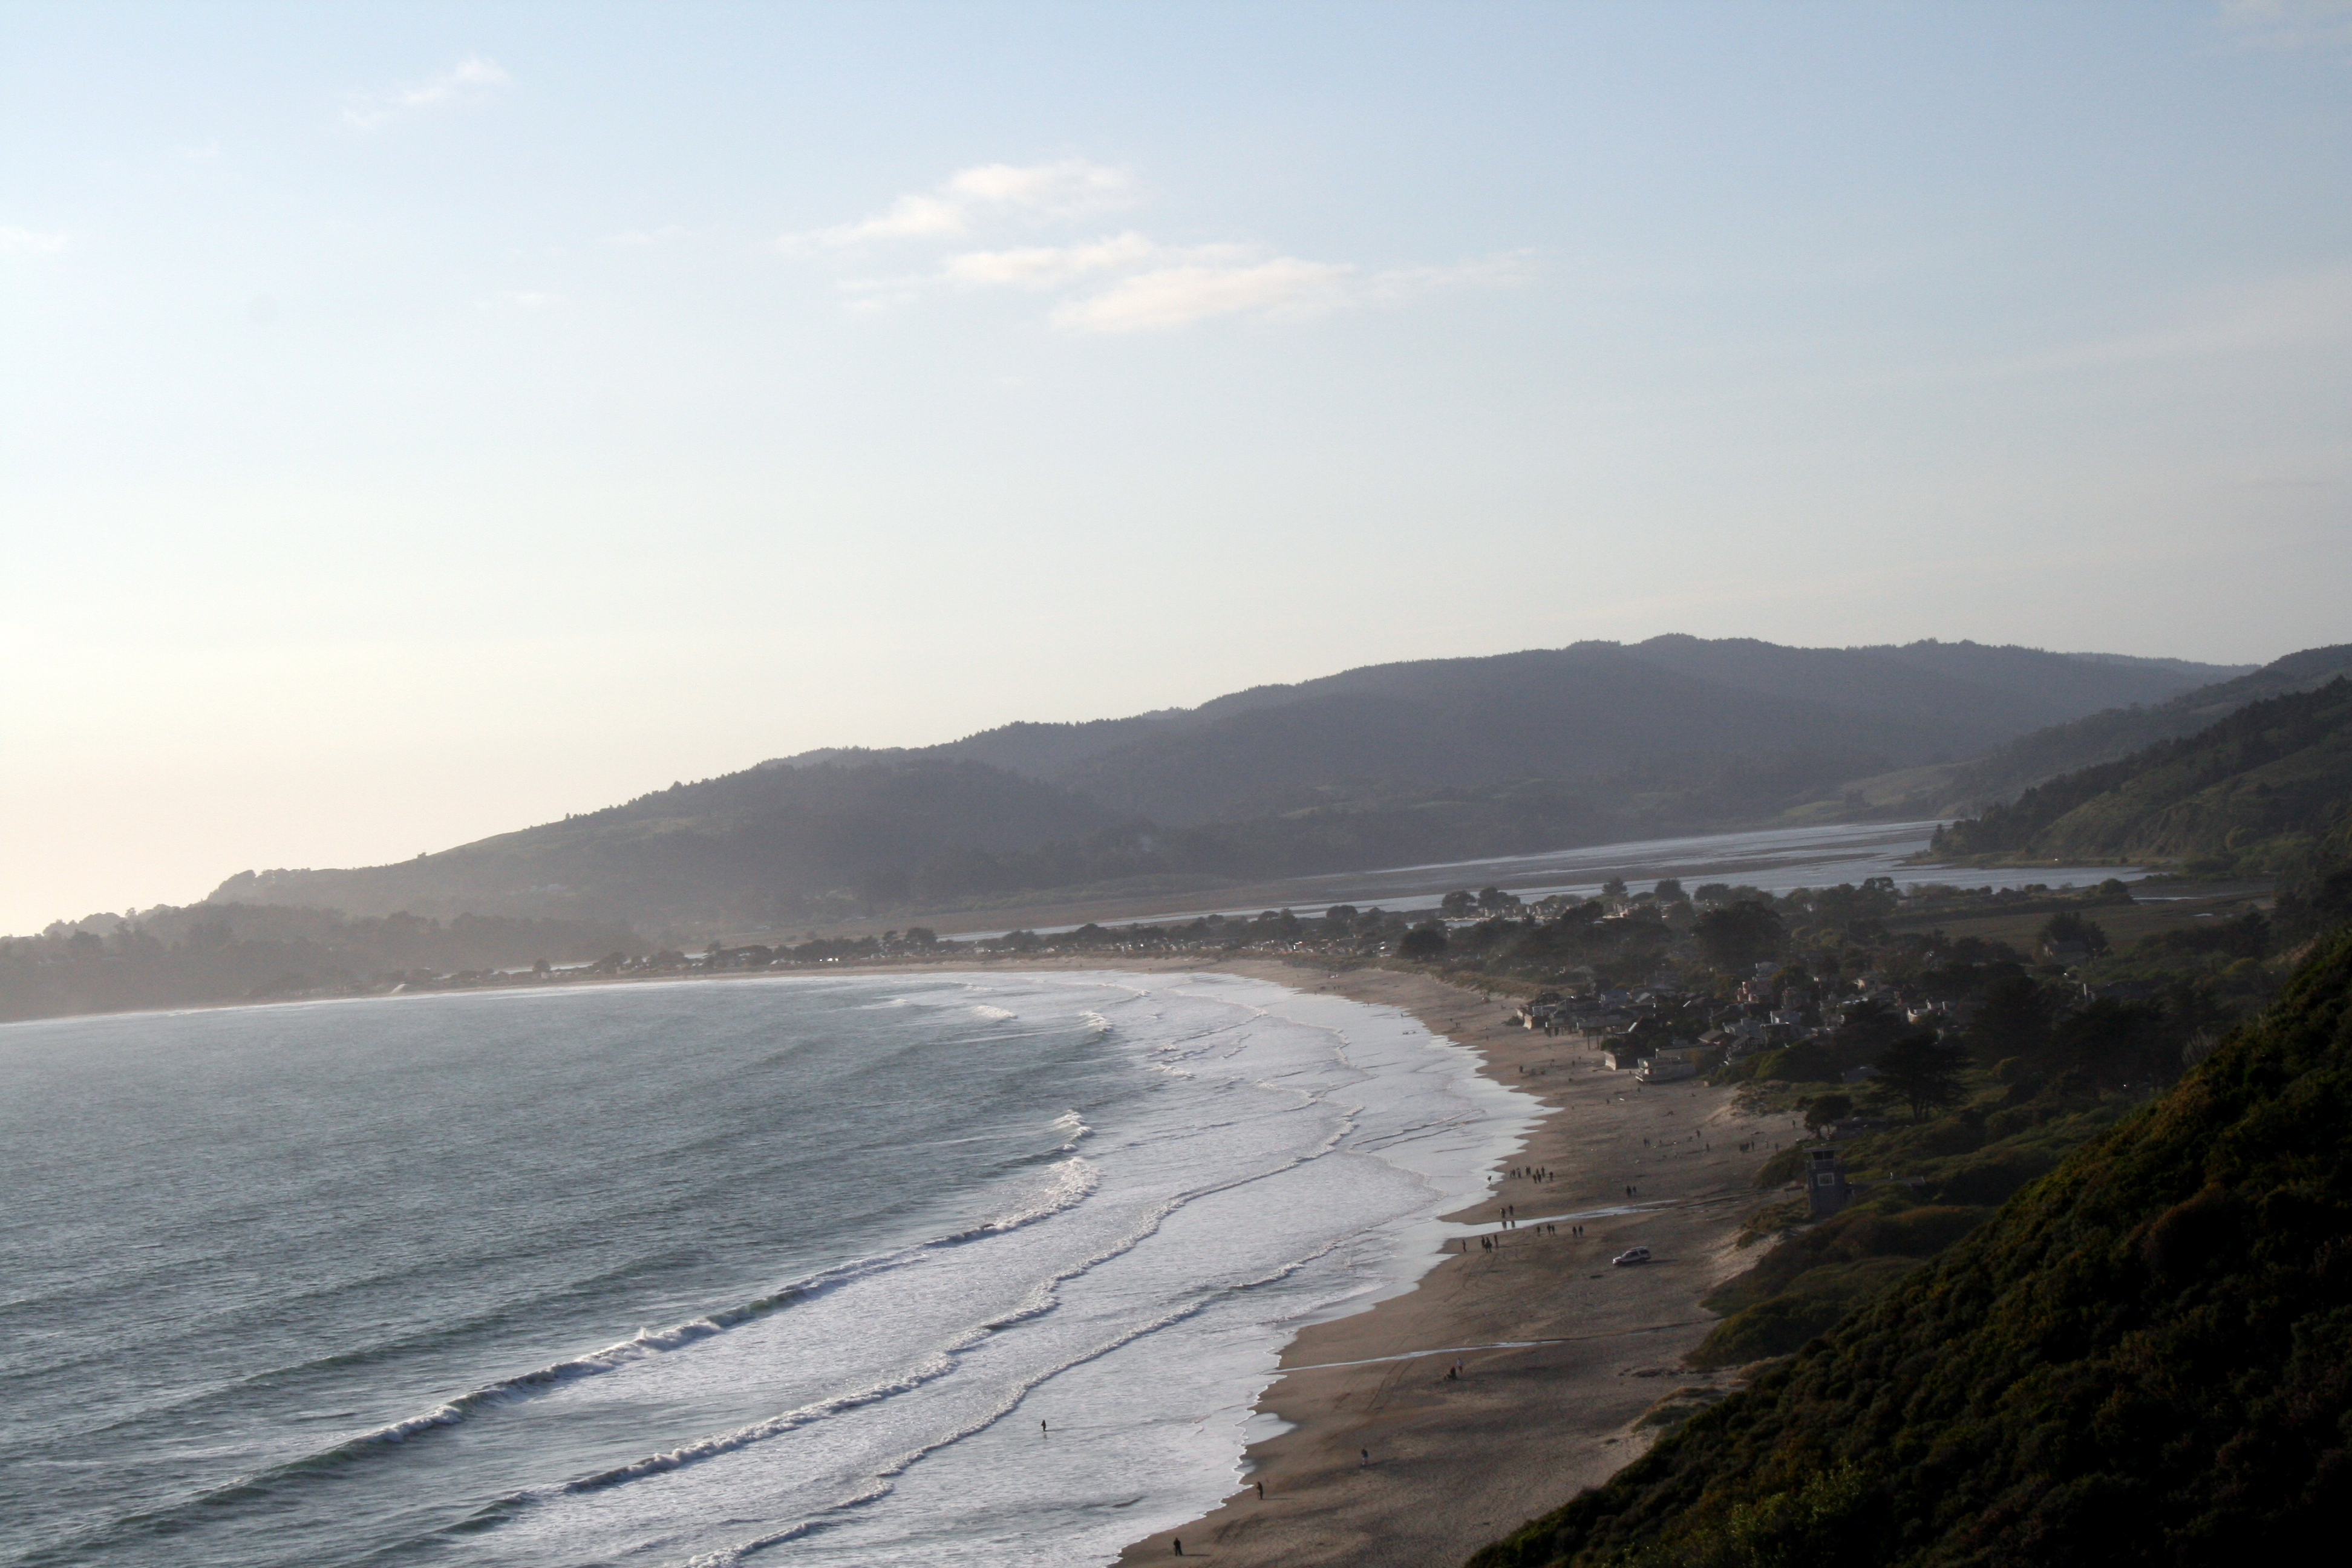 Stinson Beach IV by dhunley